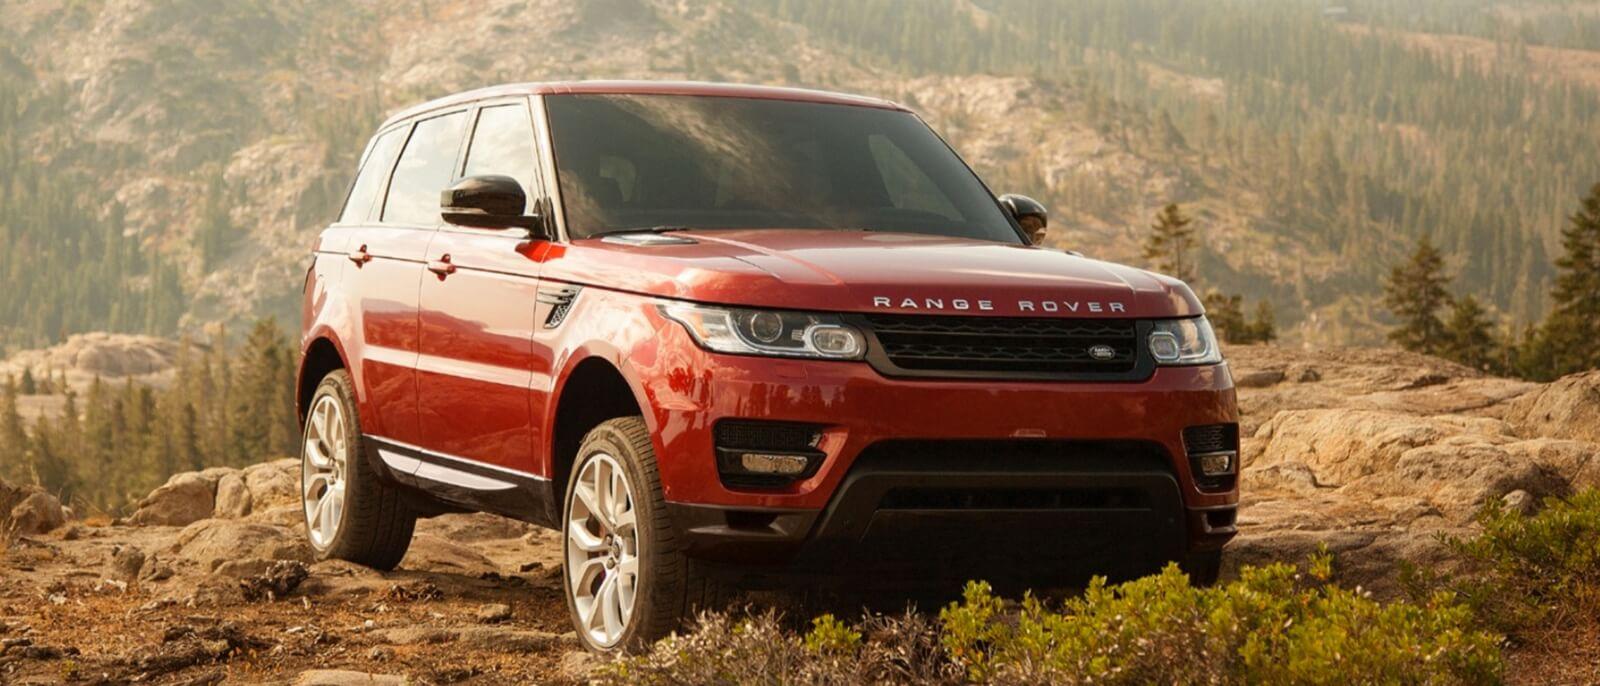 2016 Range Rover Sport main view